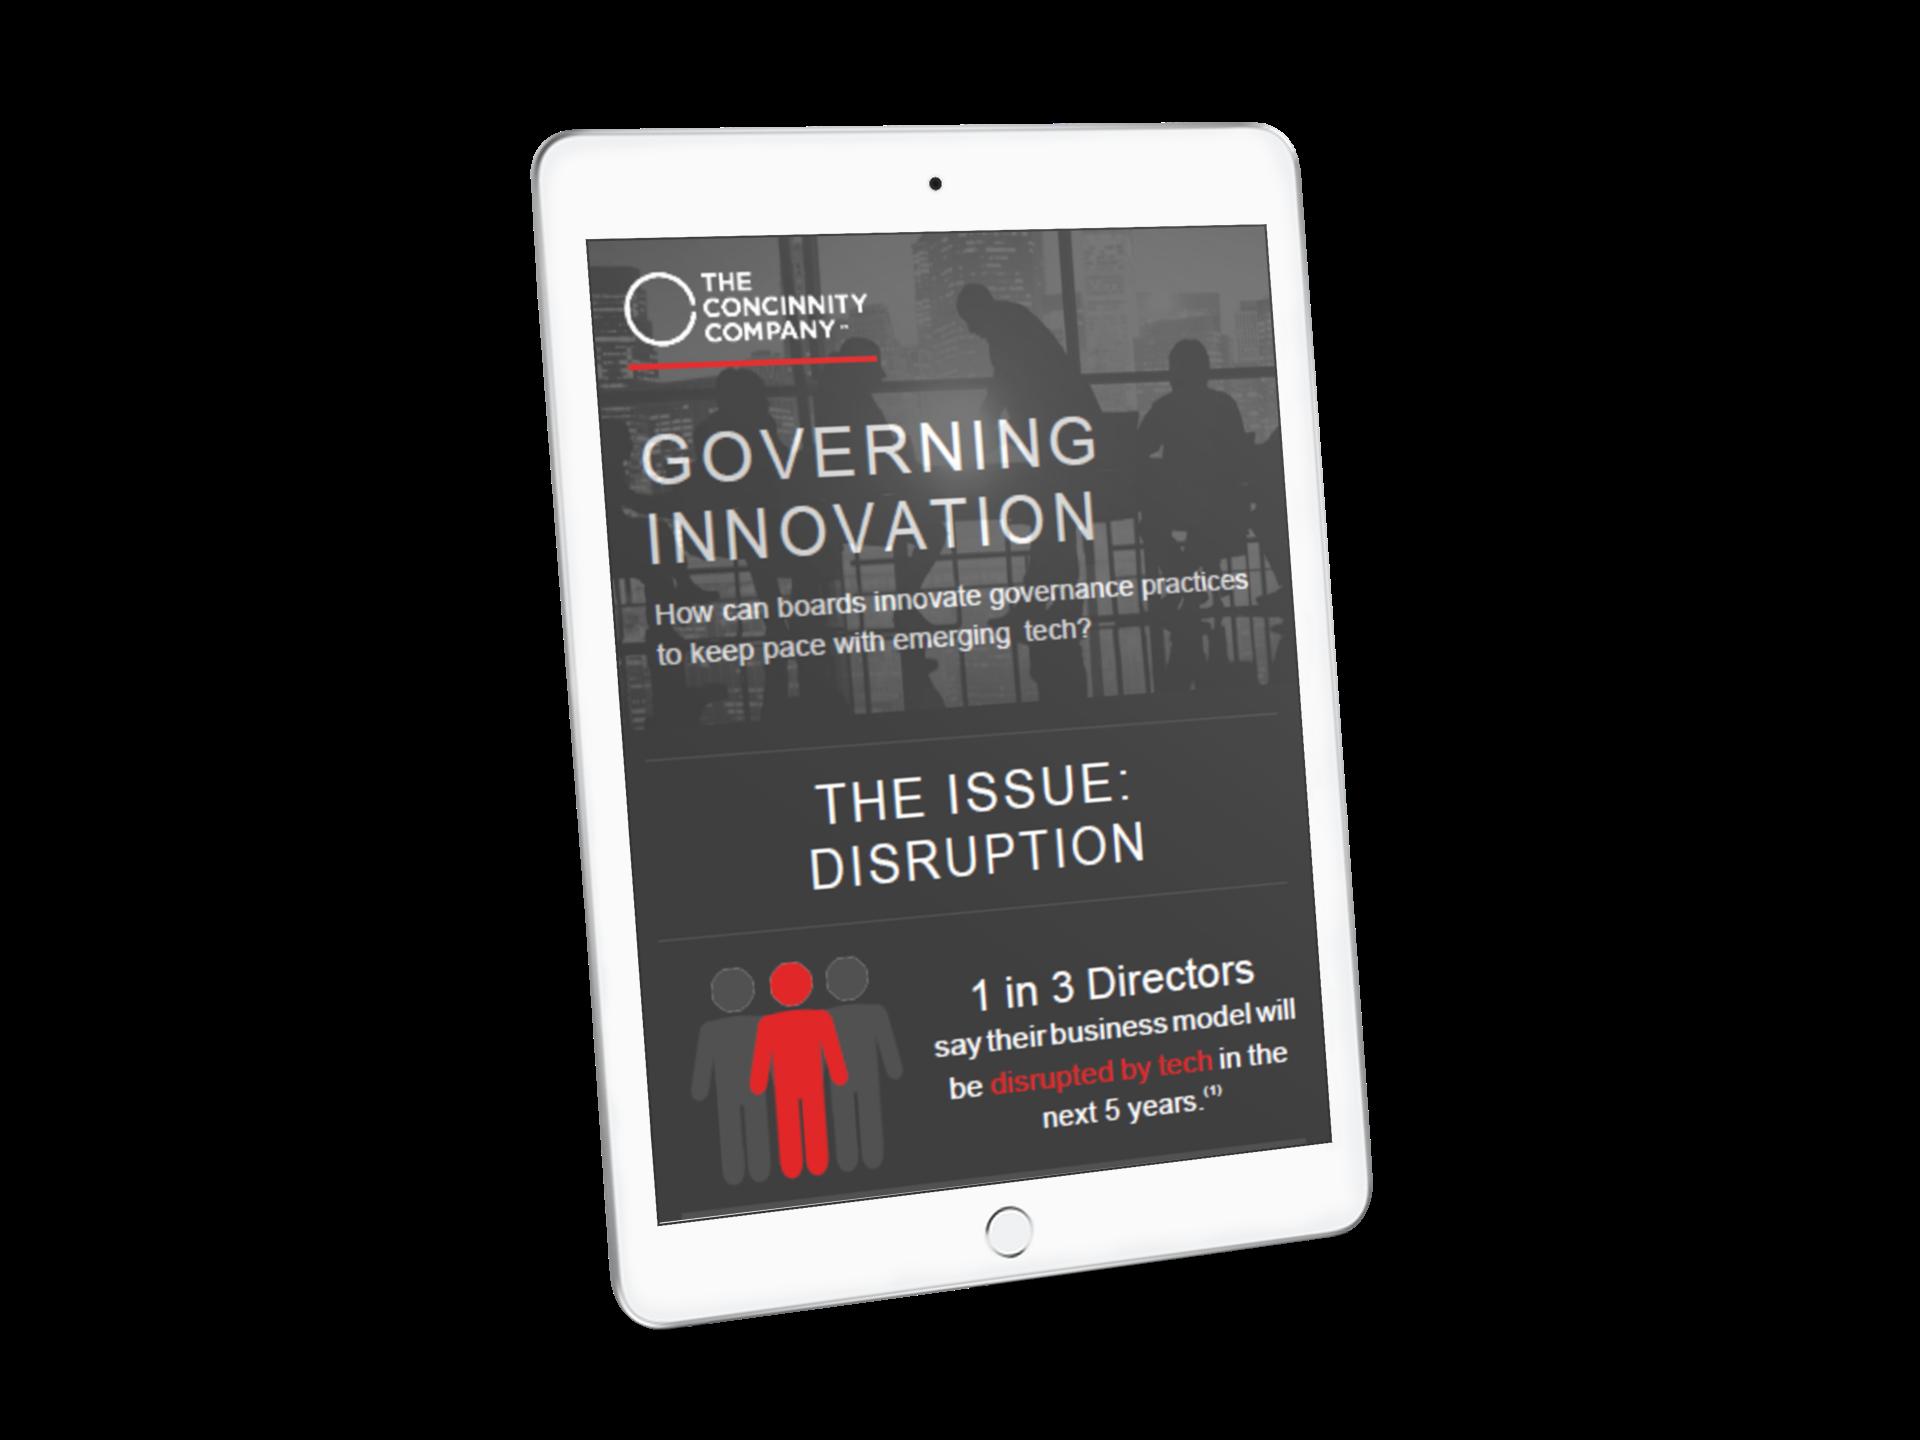 Governing Innovation angled